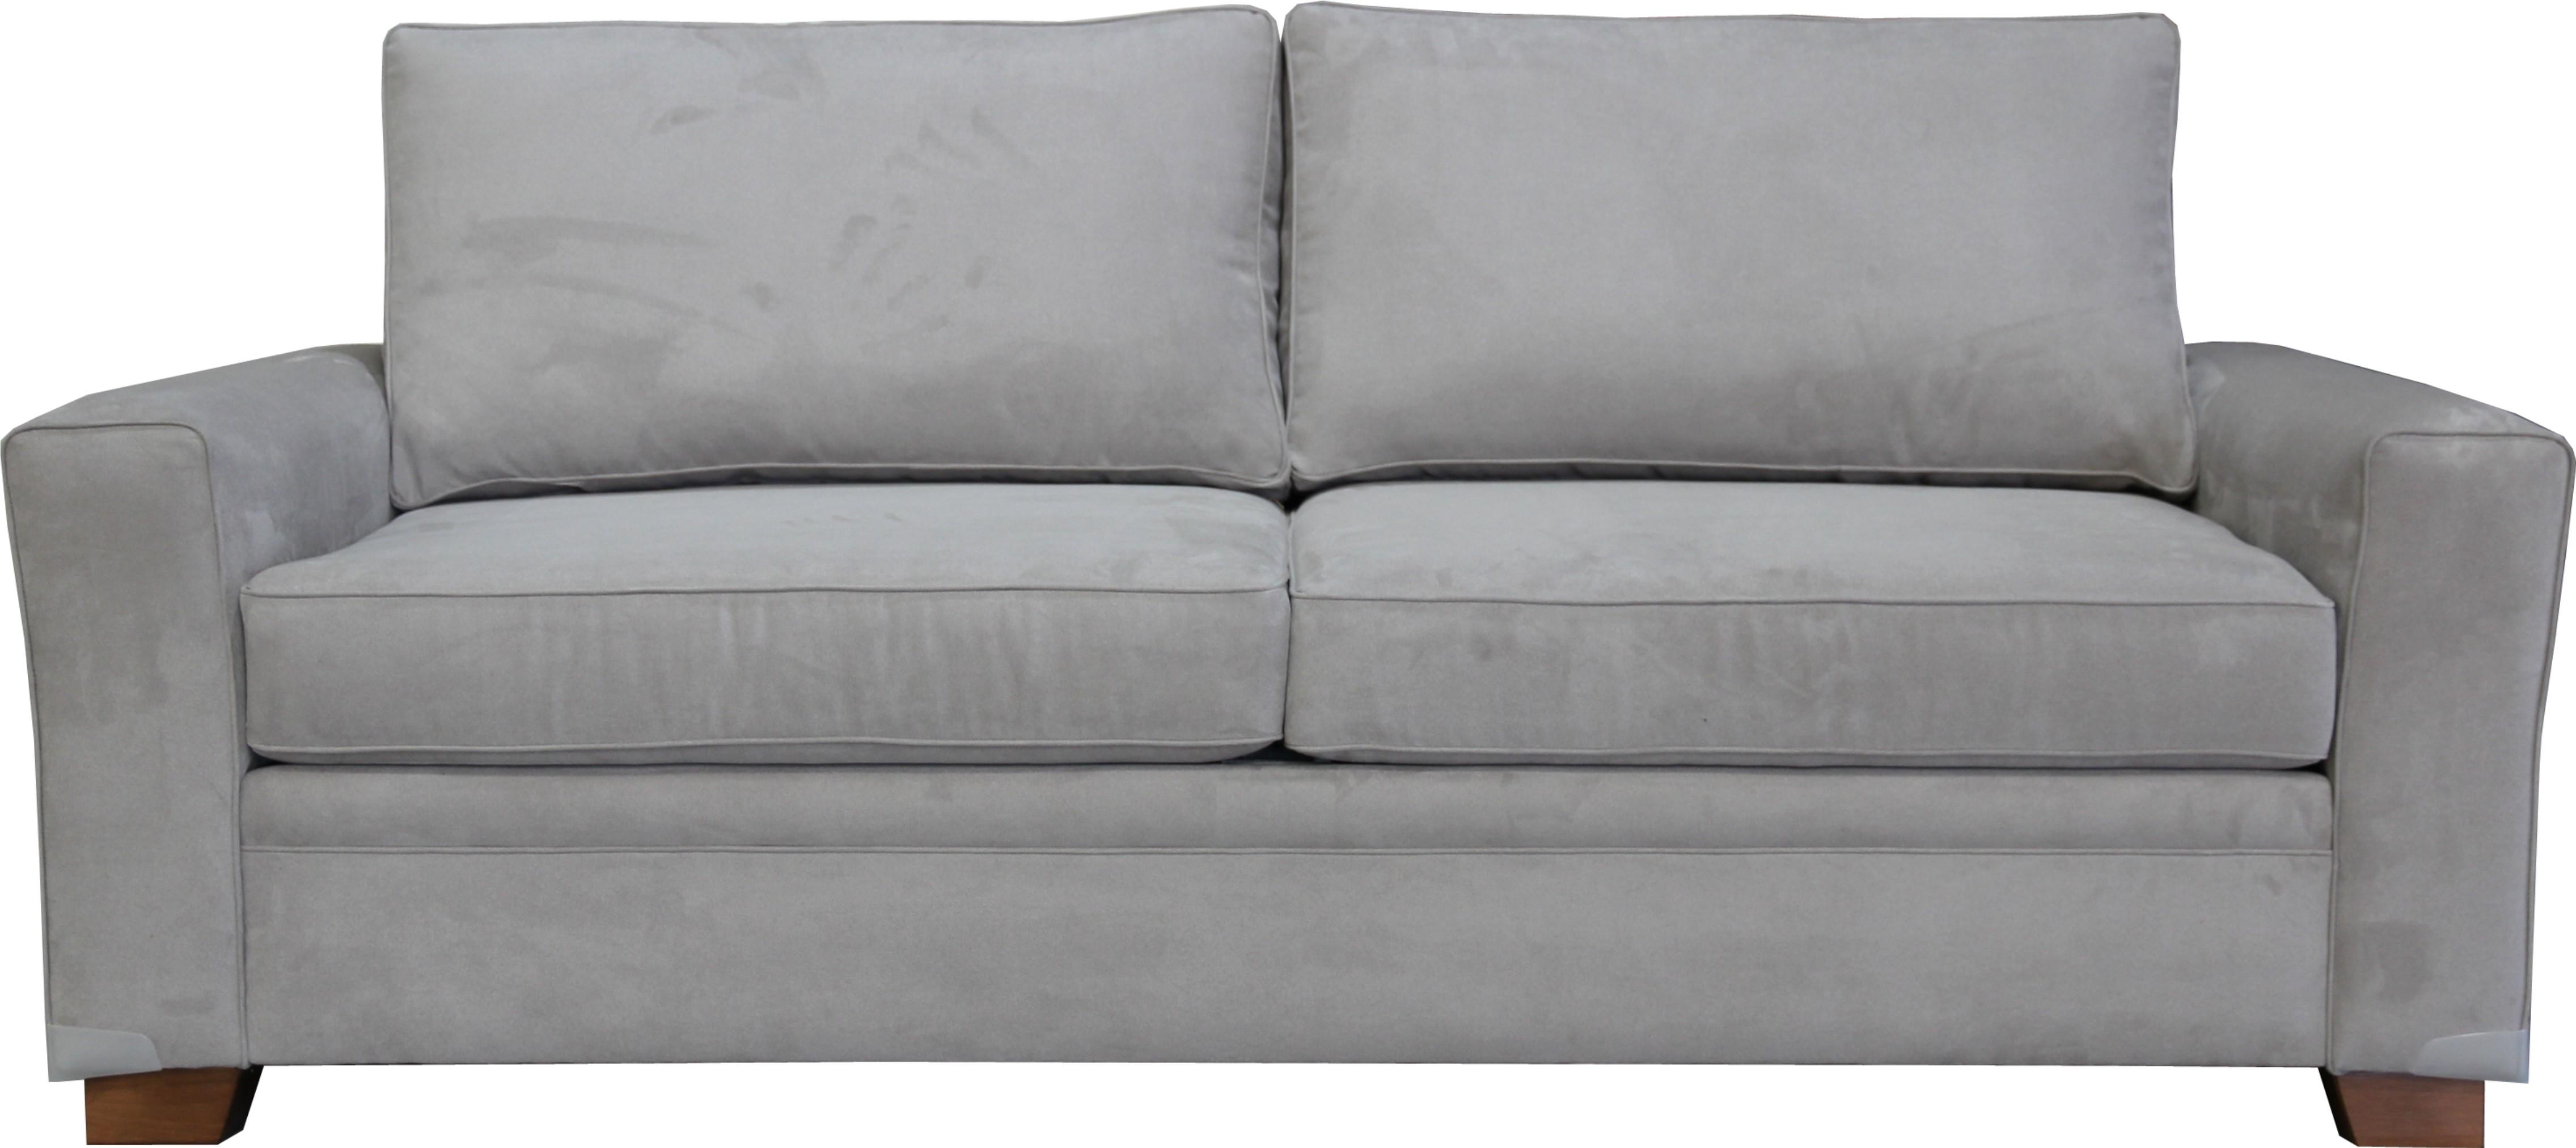 Tribeca sofa bed mataro furniture for Shale sofa bed